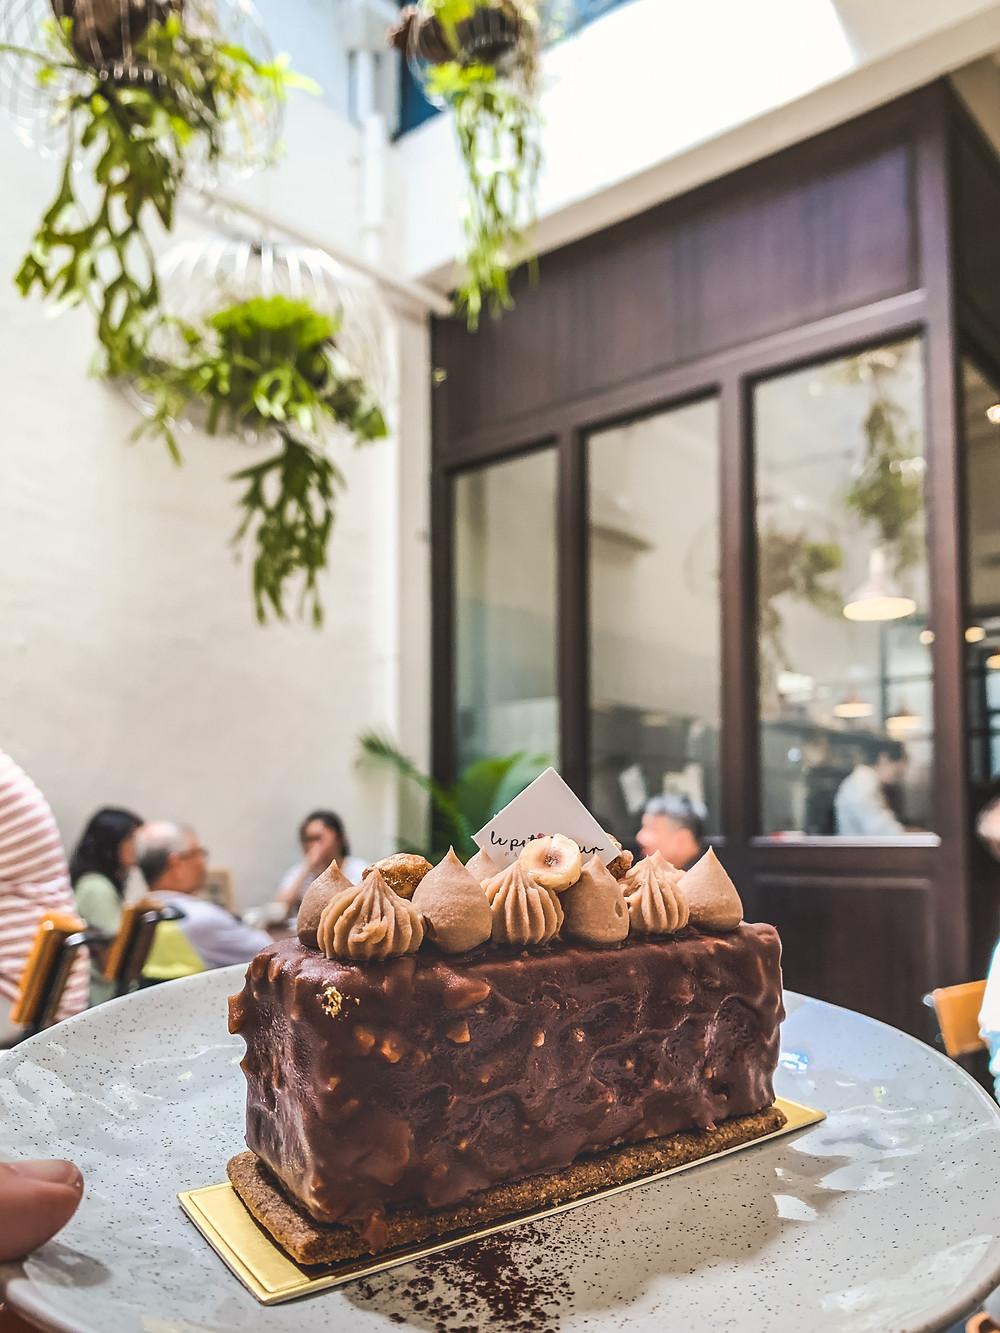 Hazelnut Chocolate French Dessert, Le Petit Four Patisserie, RollingBear Travels